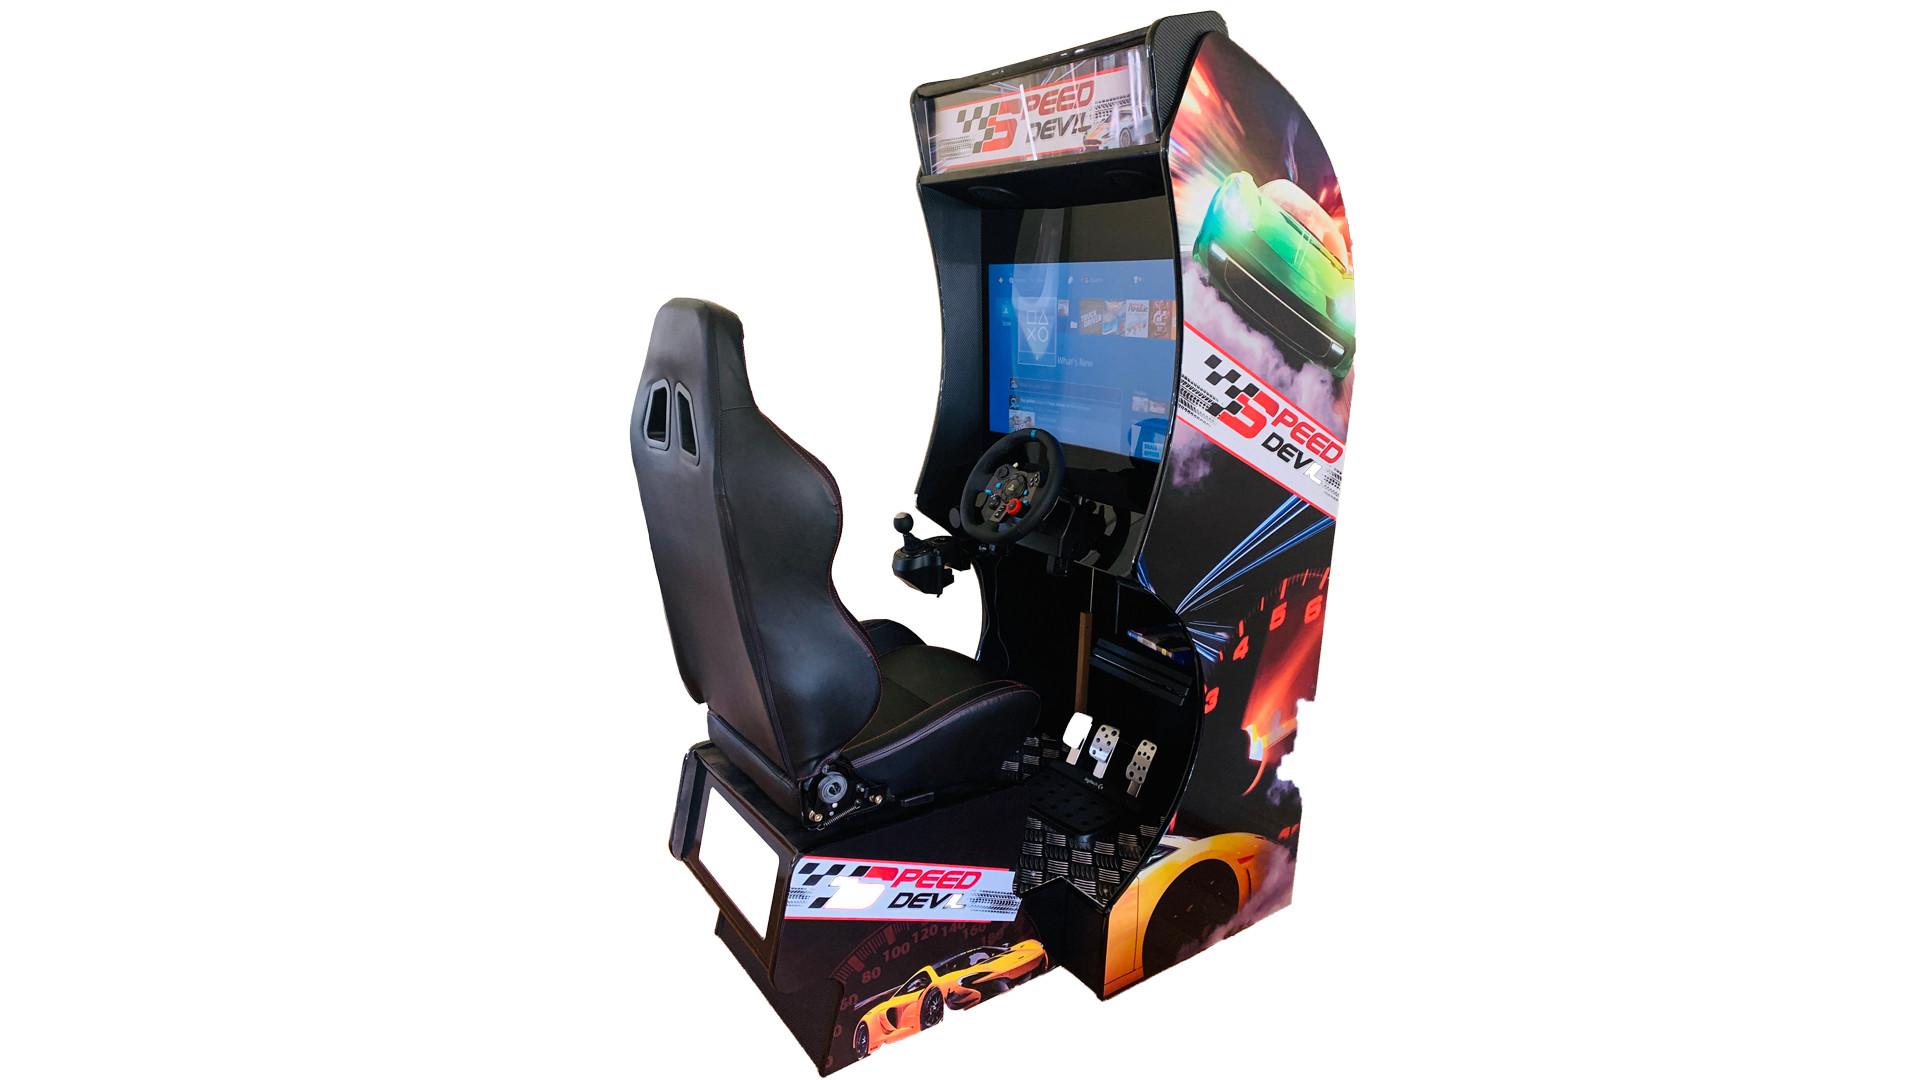 racing sim on white BG.jpg